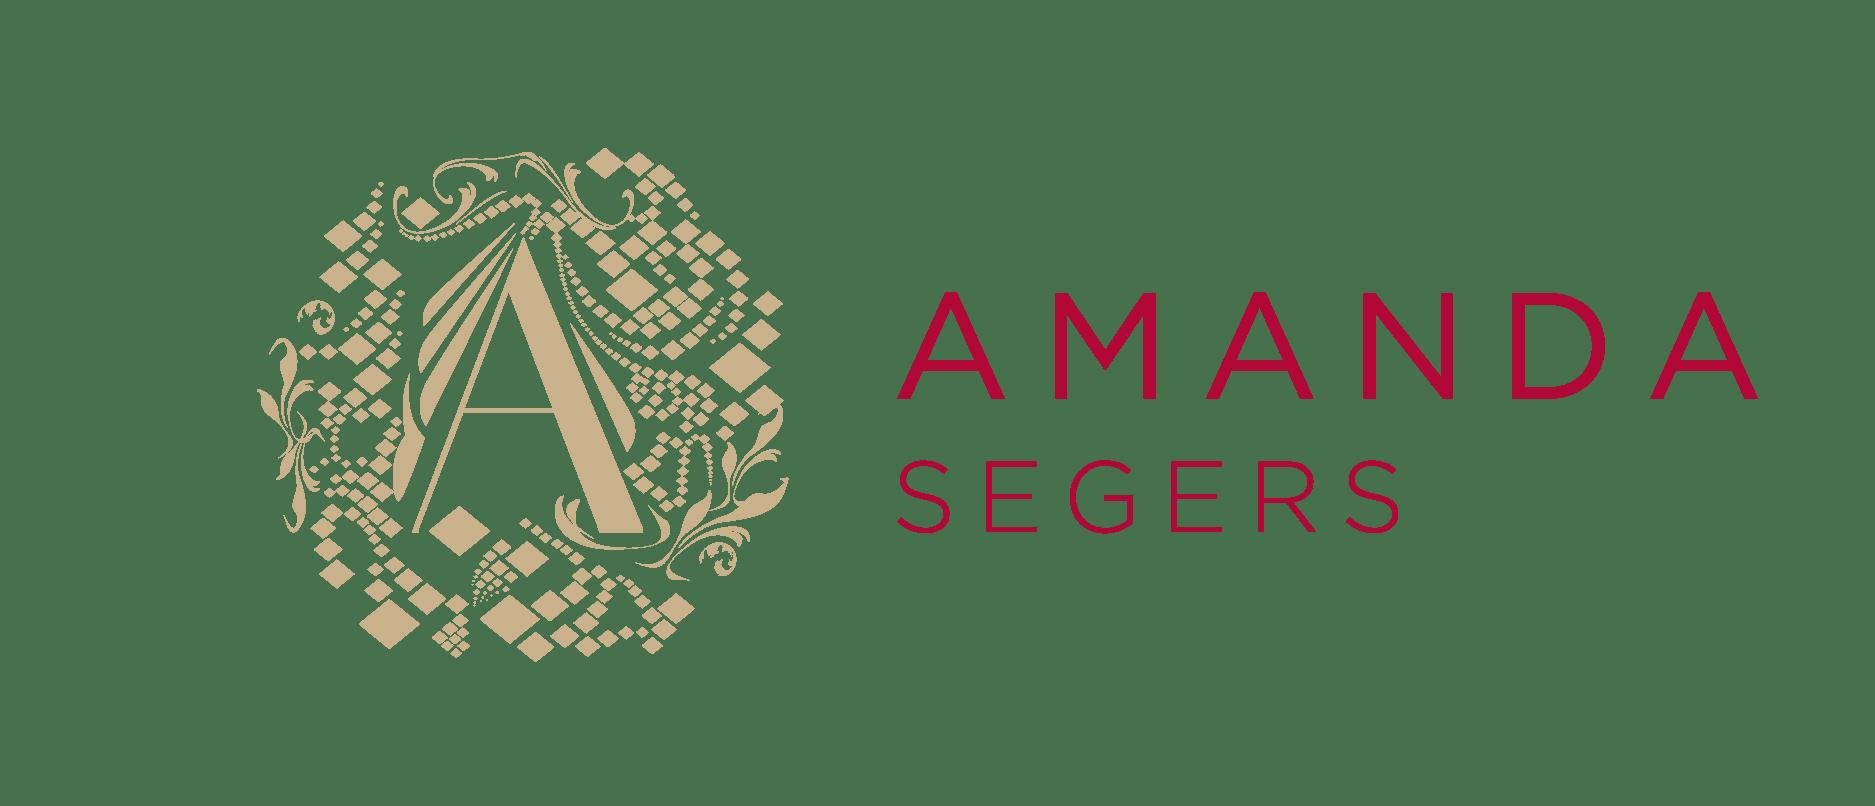 Amanda Segers